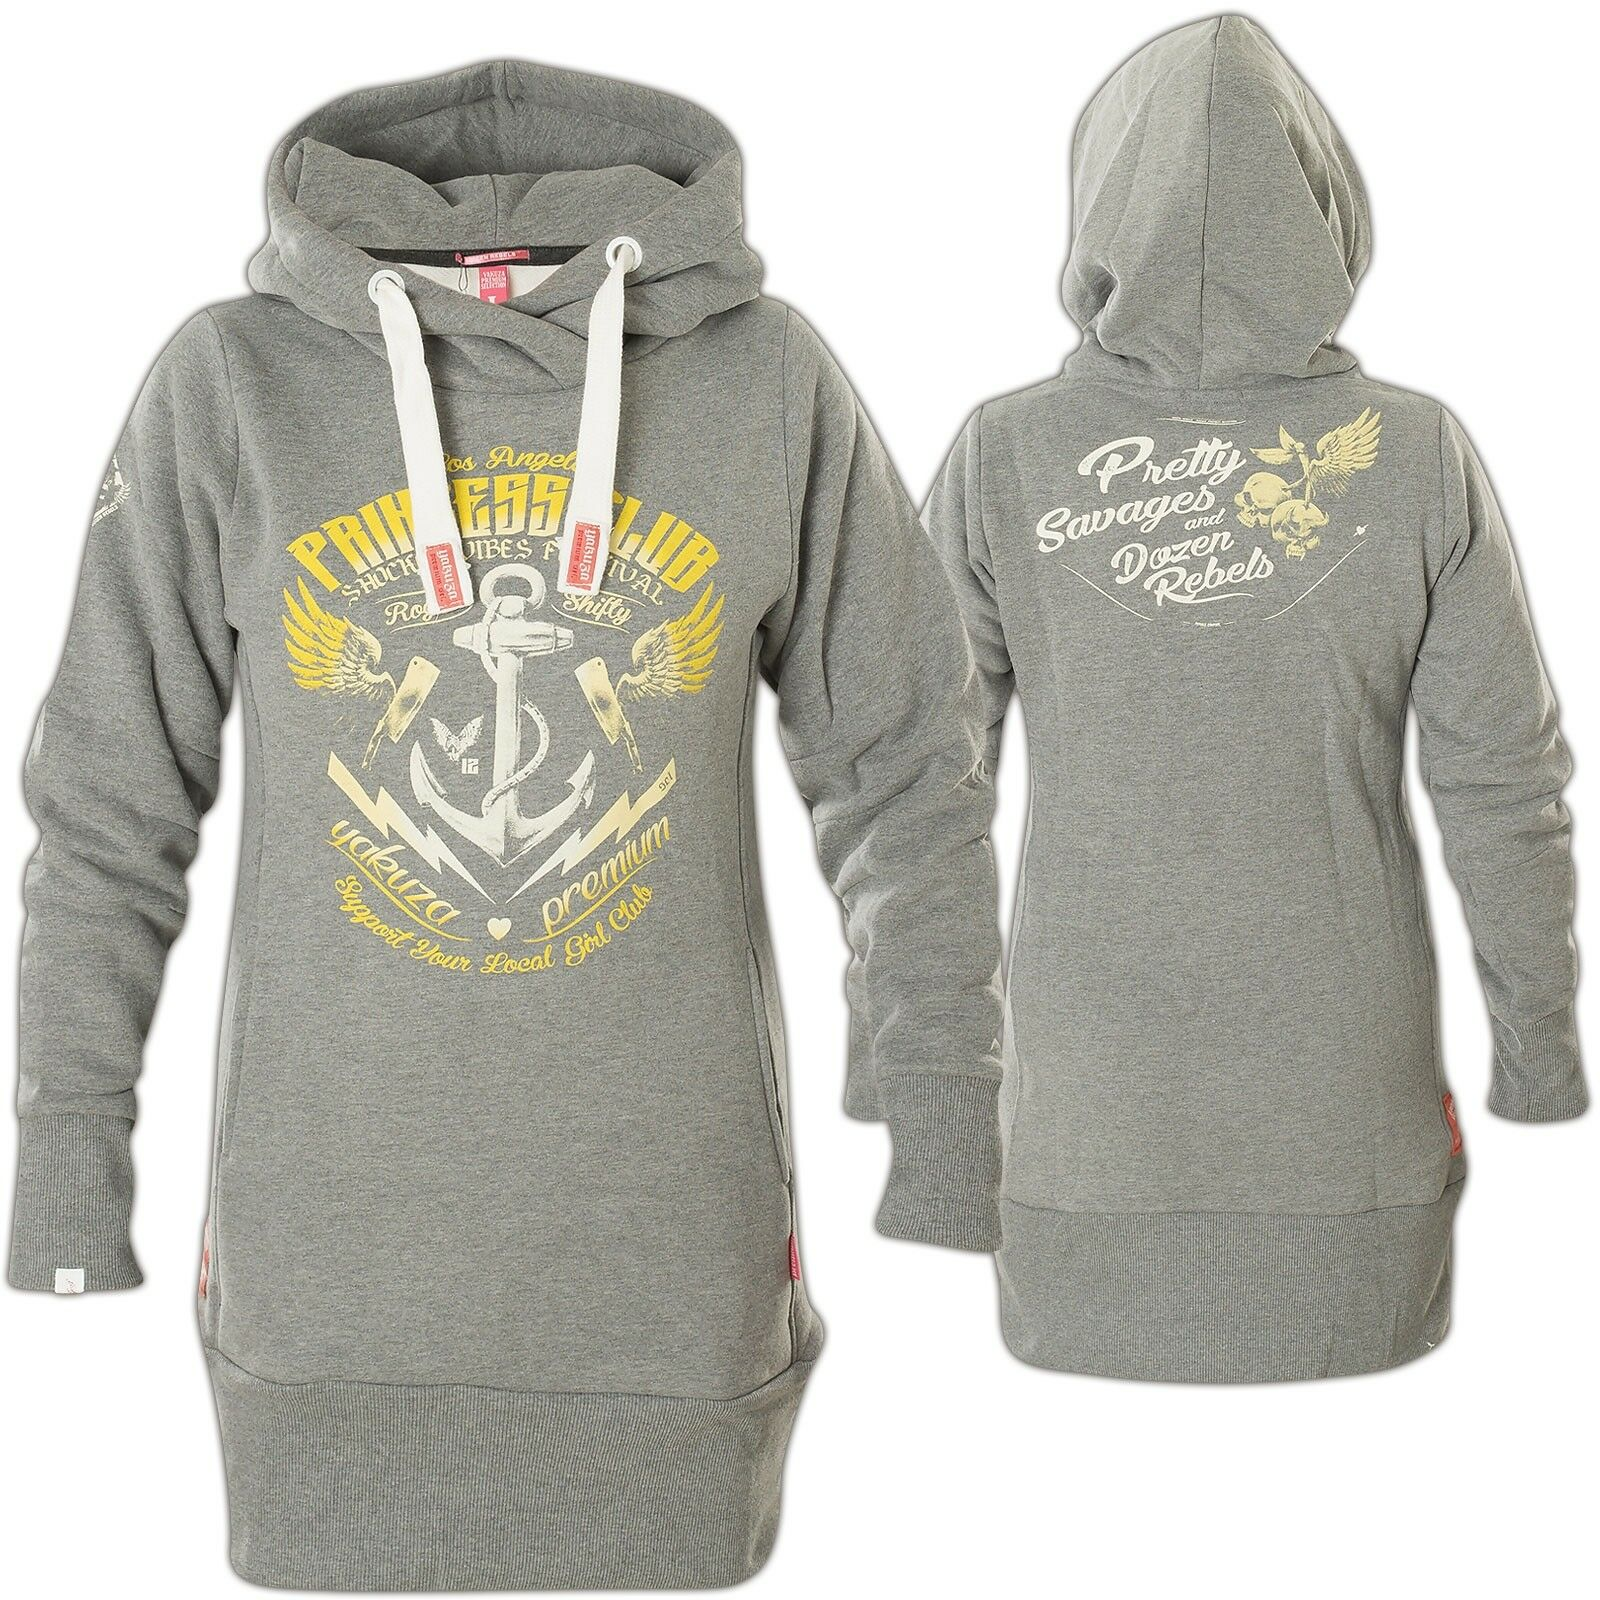 YAKUZA PREMIUM Damen Hoody GH-2443 Hellgrau Hoodies  Sweatshirts mit